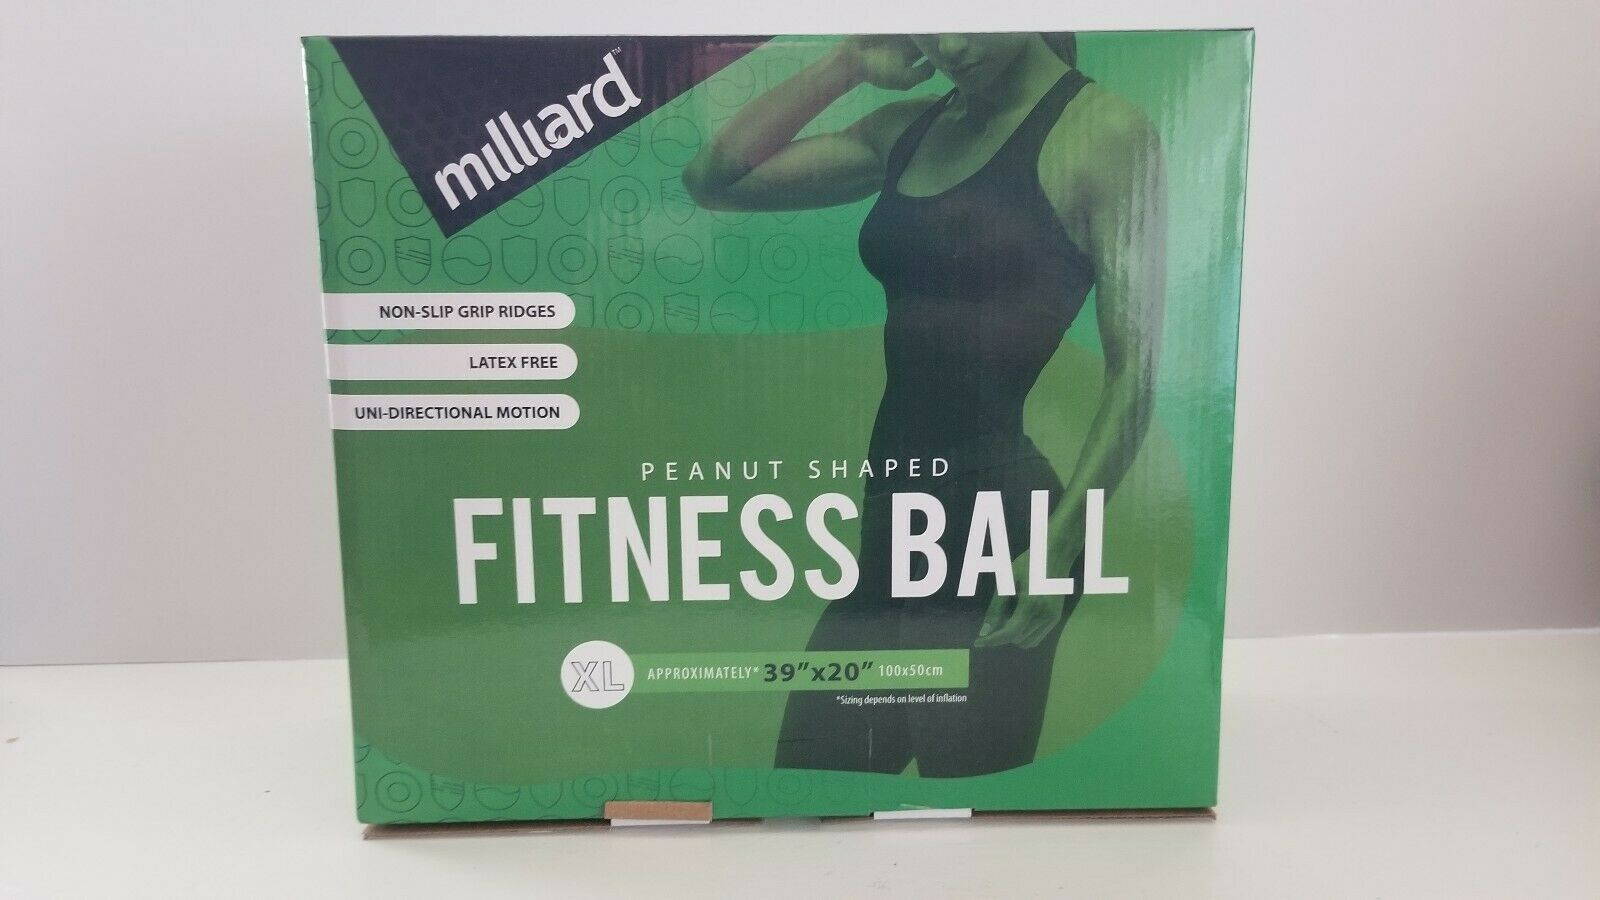 Physio Roll 80x40cm Milliard Anti-Burst Peanut Ball Approximately 31x15